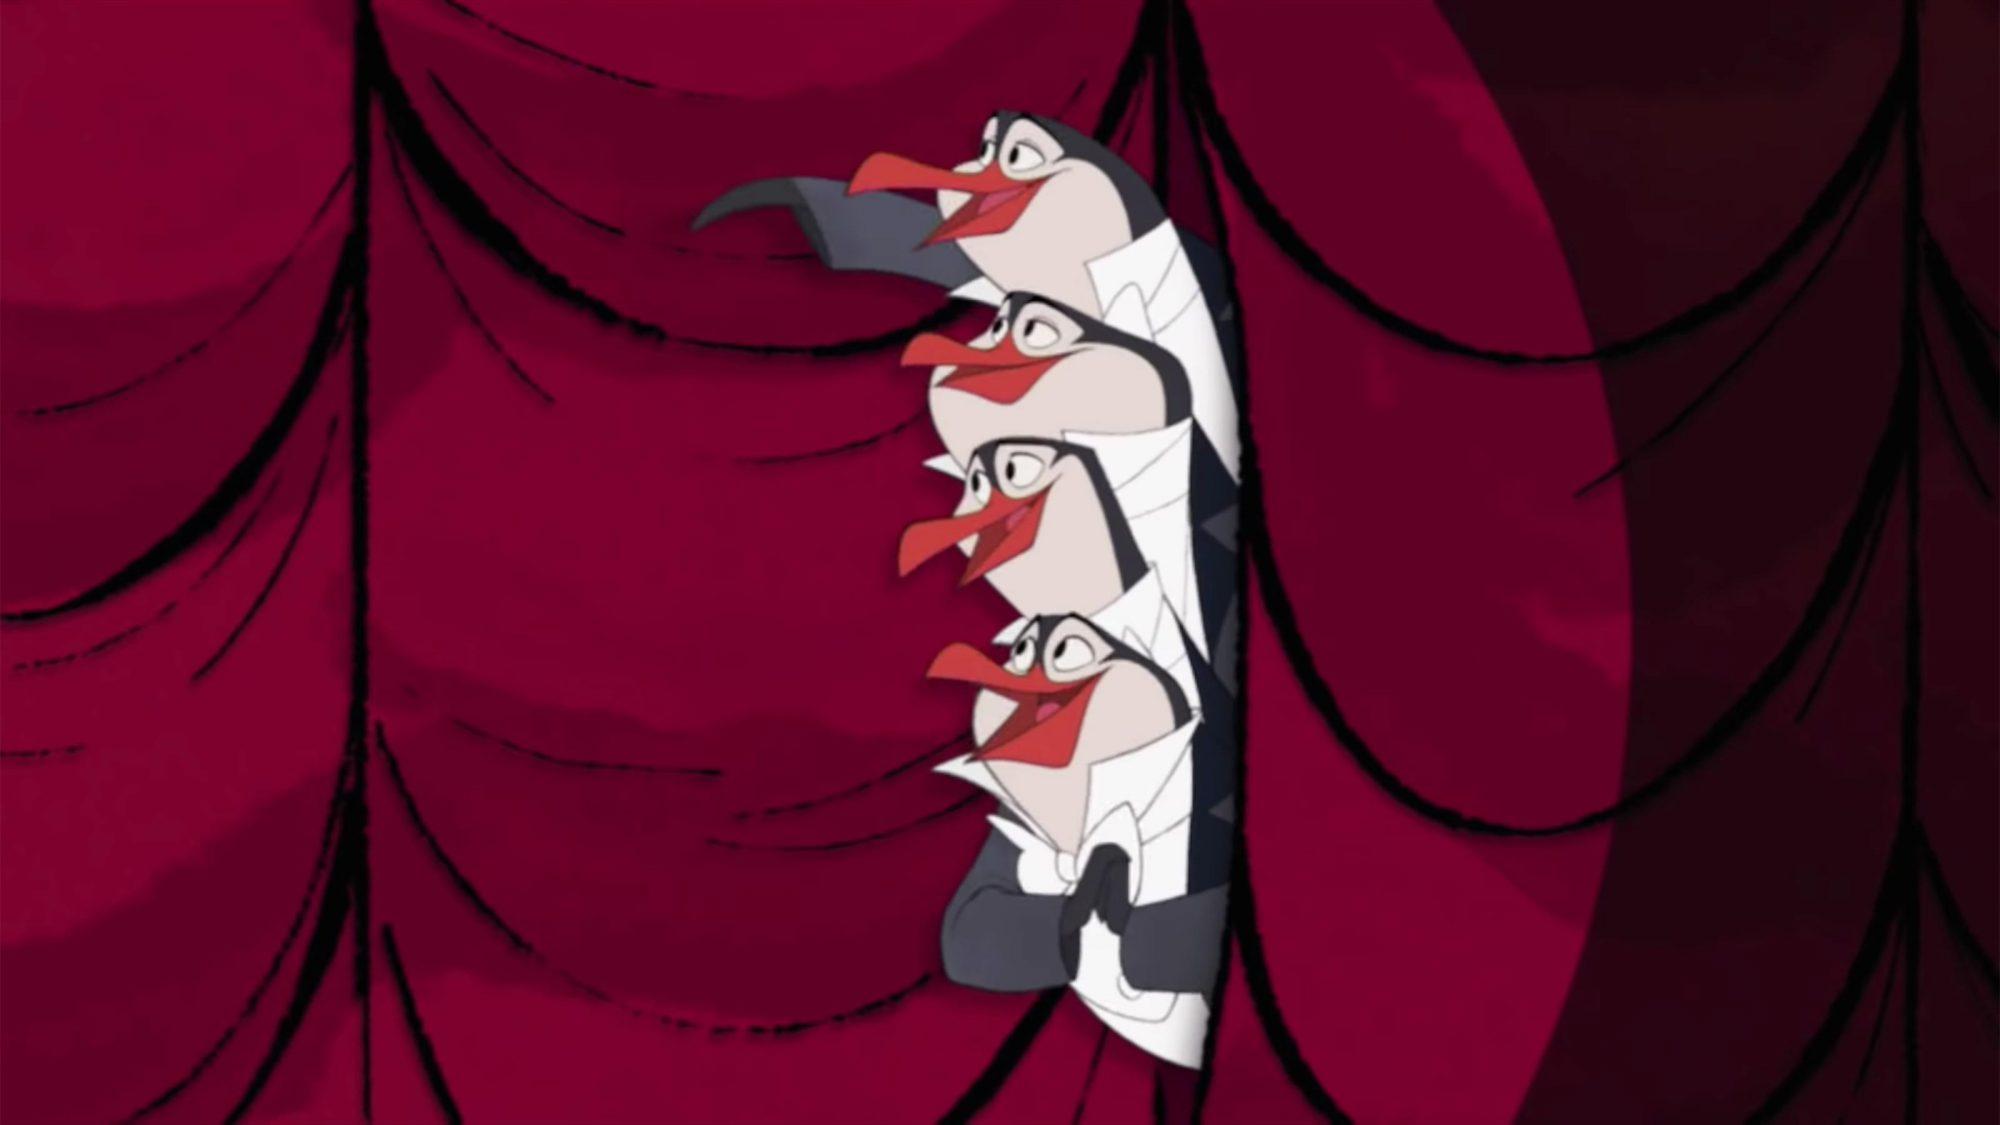 Penguins24